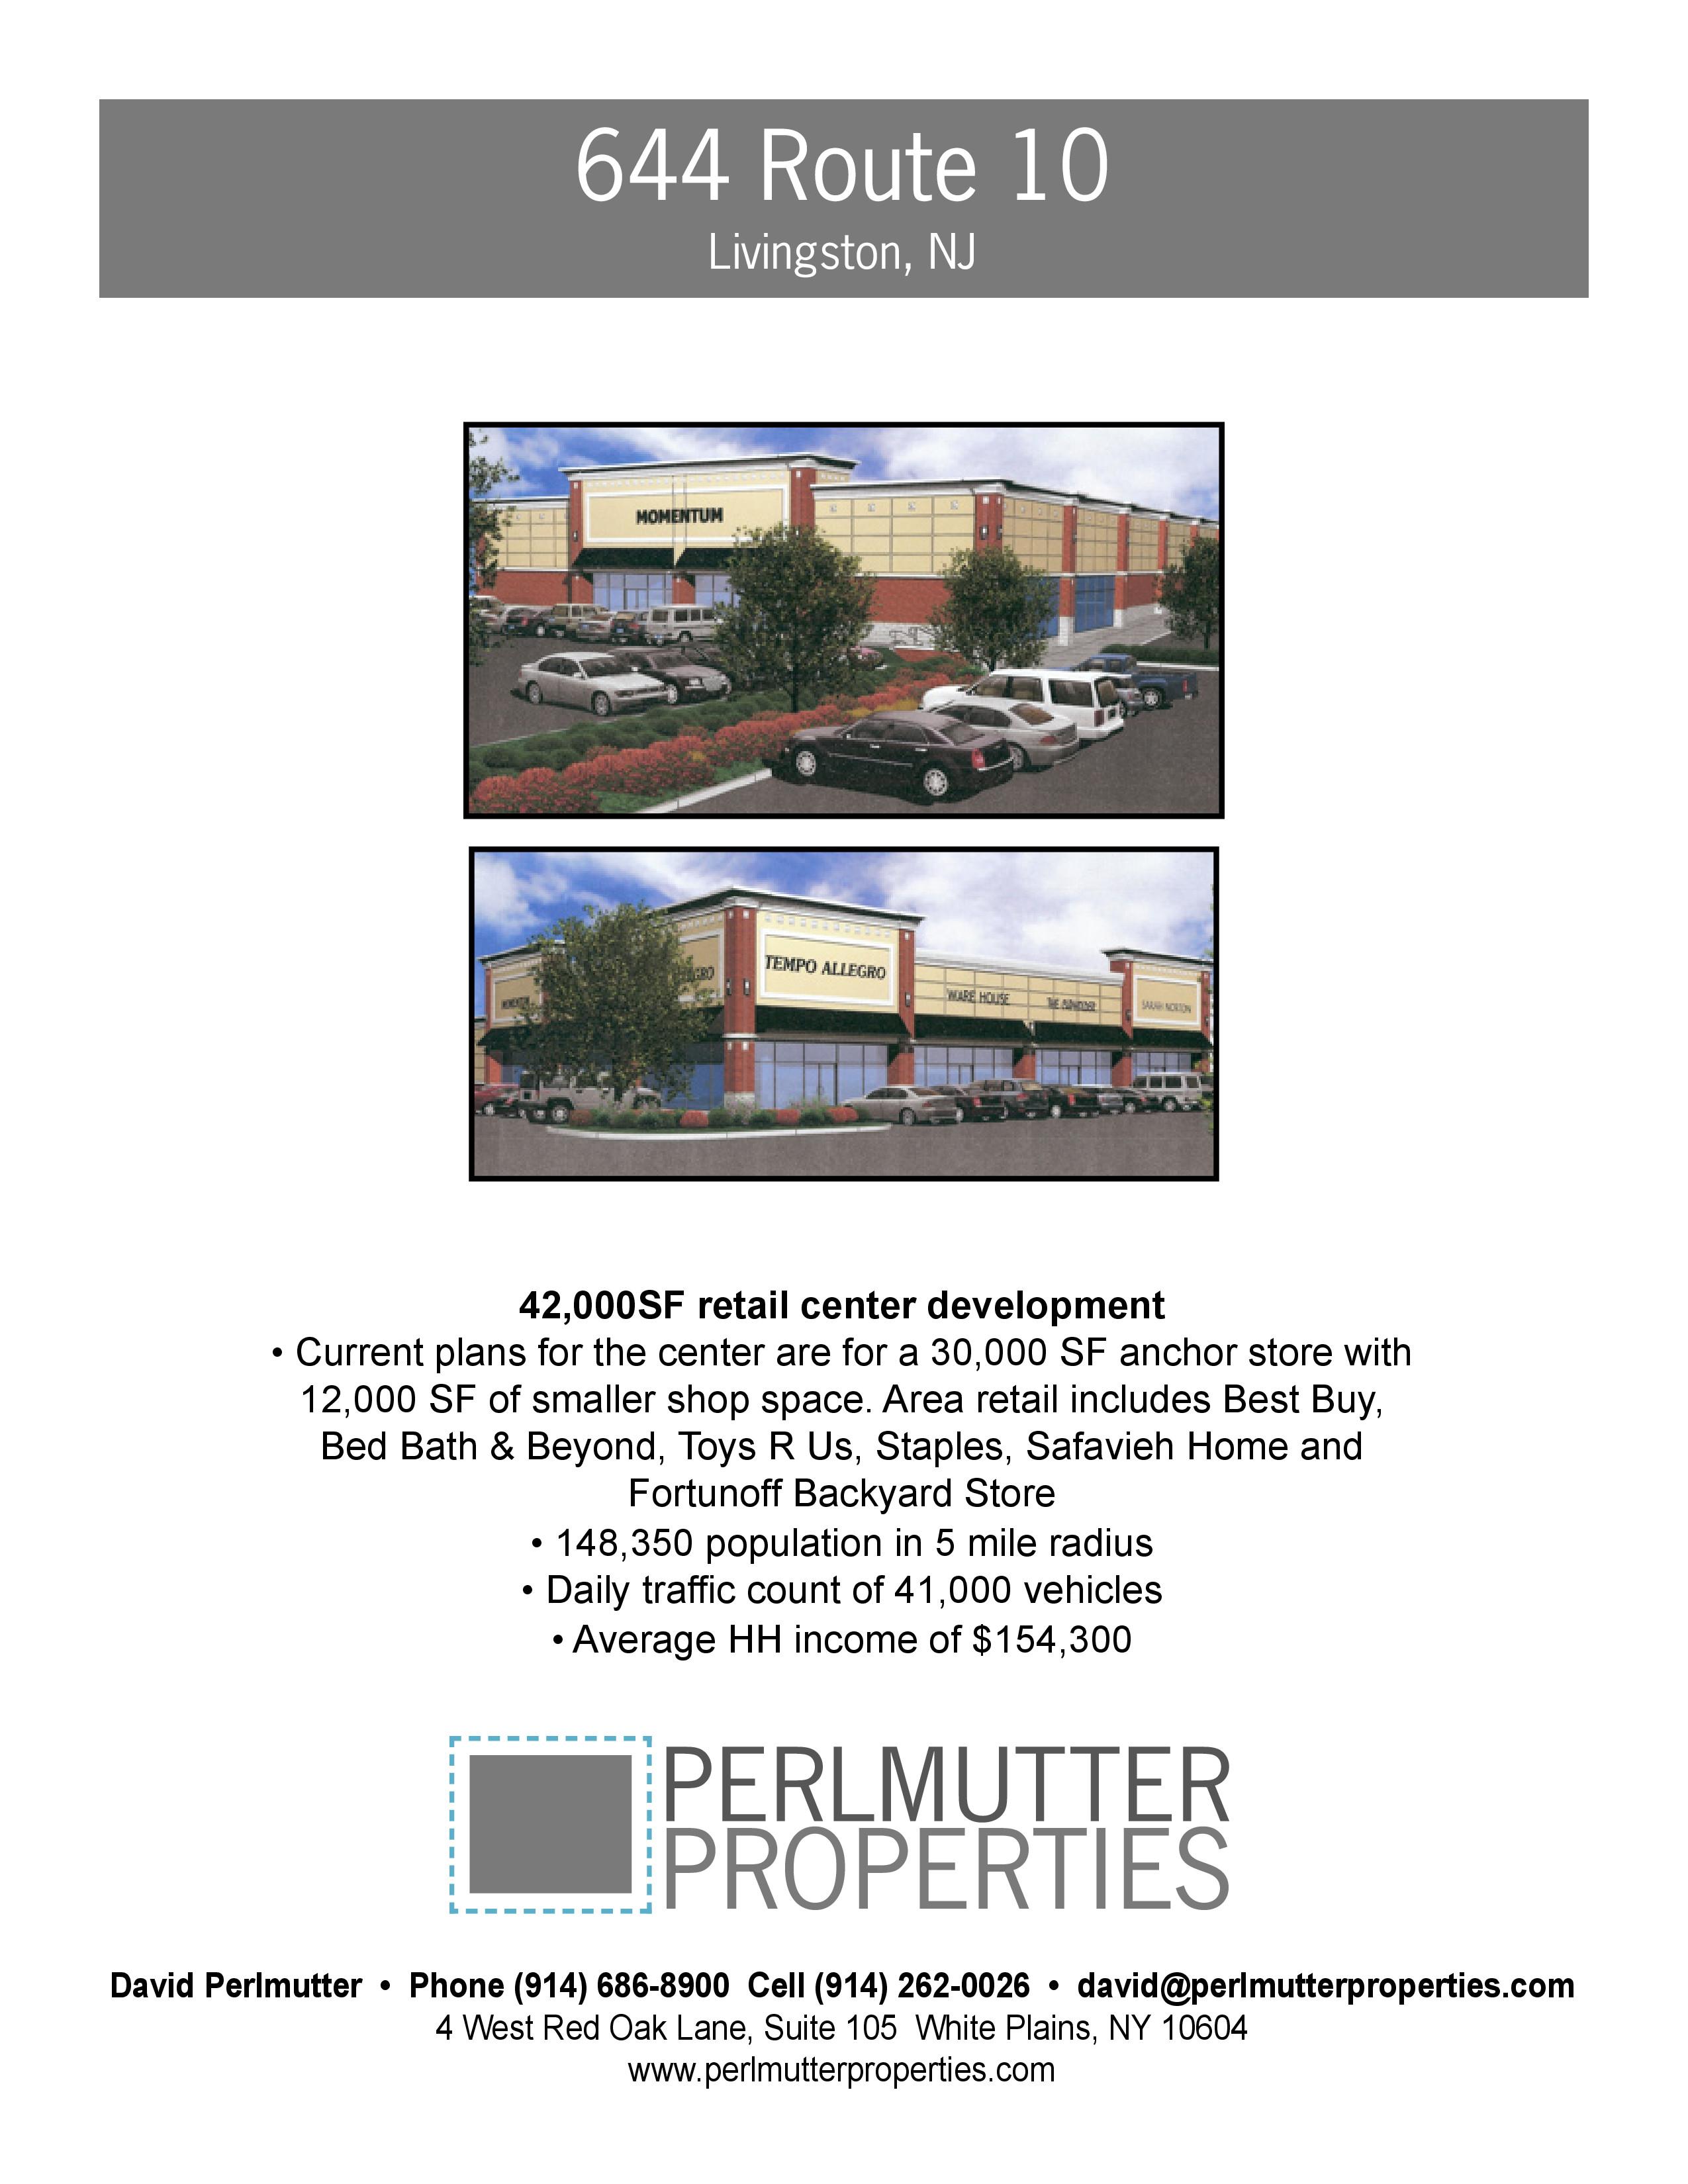 Real Estate   Development Site   644 Rt. 10 Livingston NJ | QuantumListing